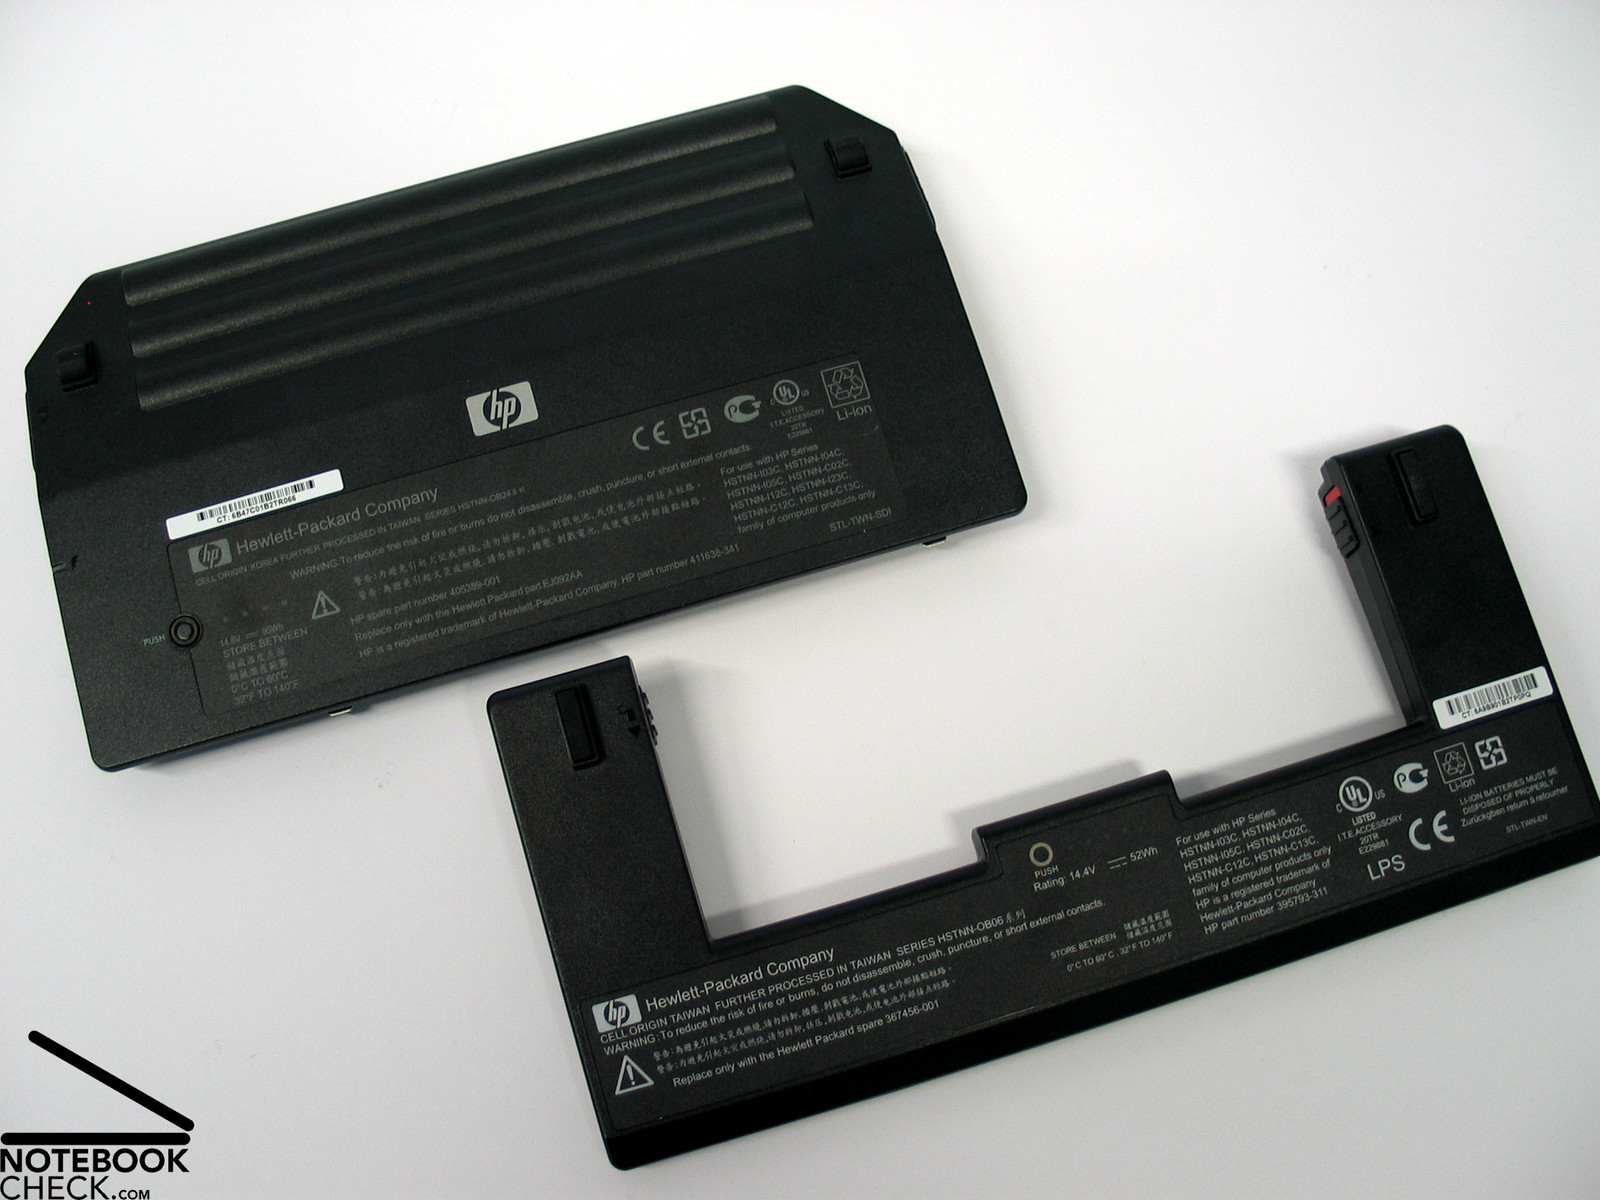 Test HP Compaq nc6400 Notebook - Notebookcheck.com Tests